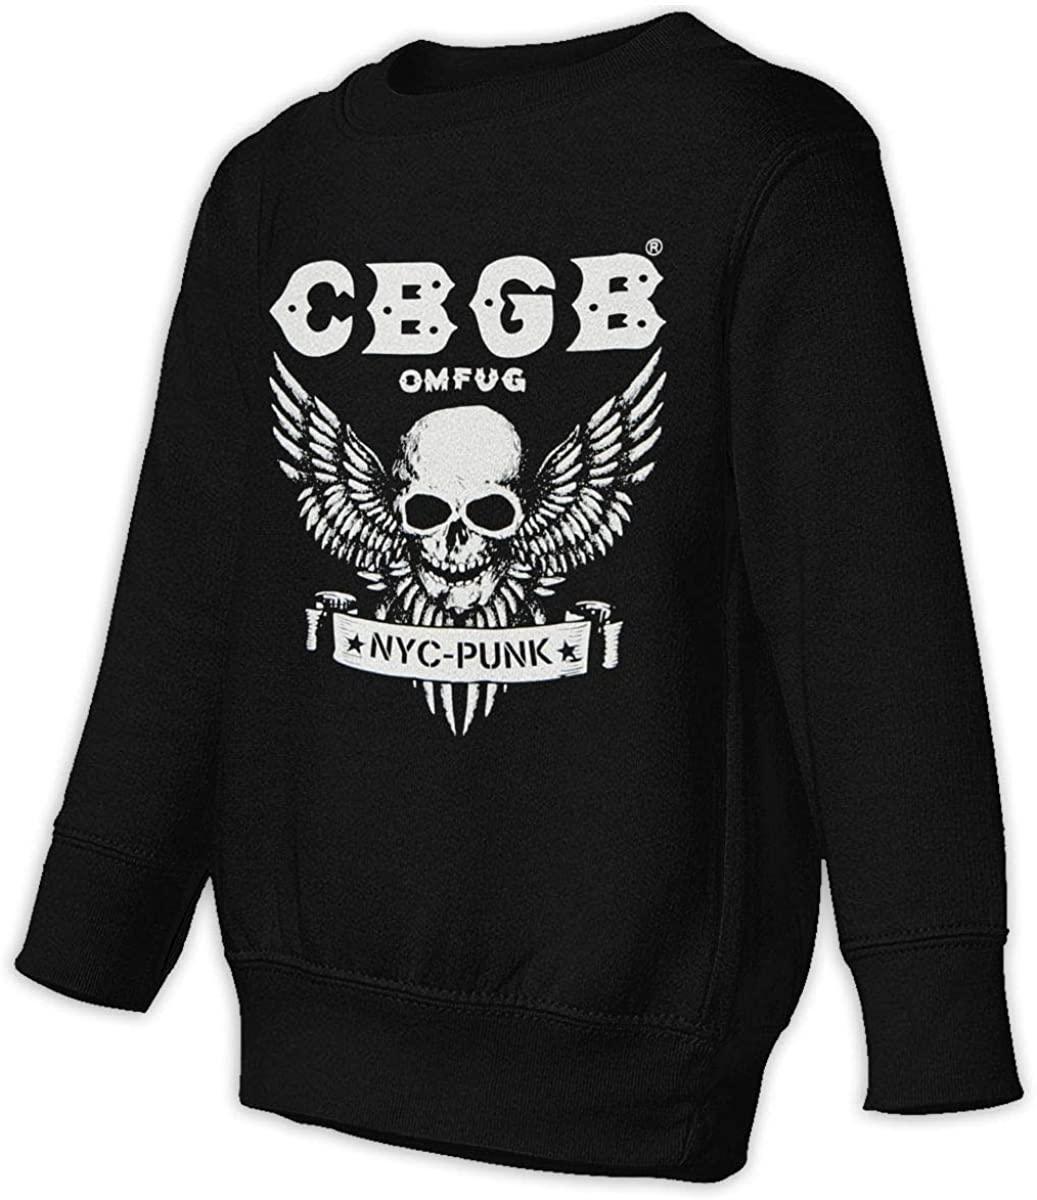 NOT CBGB Unisex Sweatshirt Youth Boy and Girls Pullover Sweatshirt